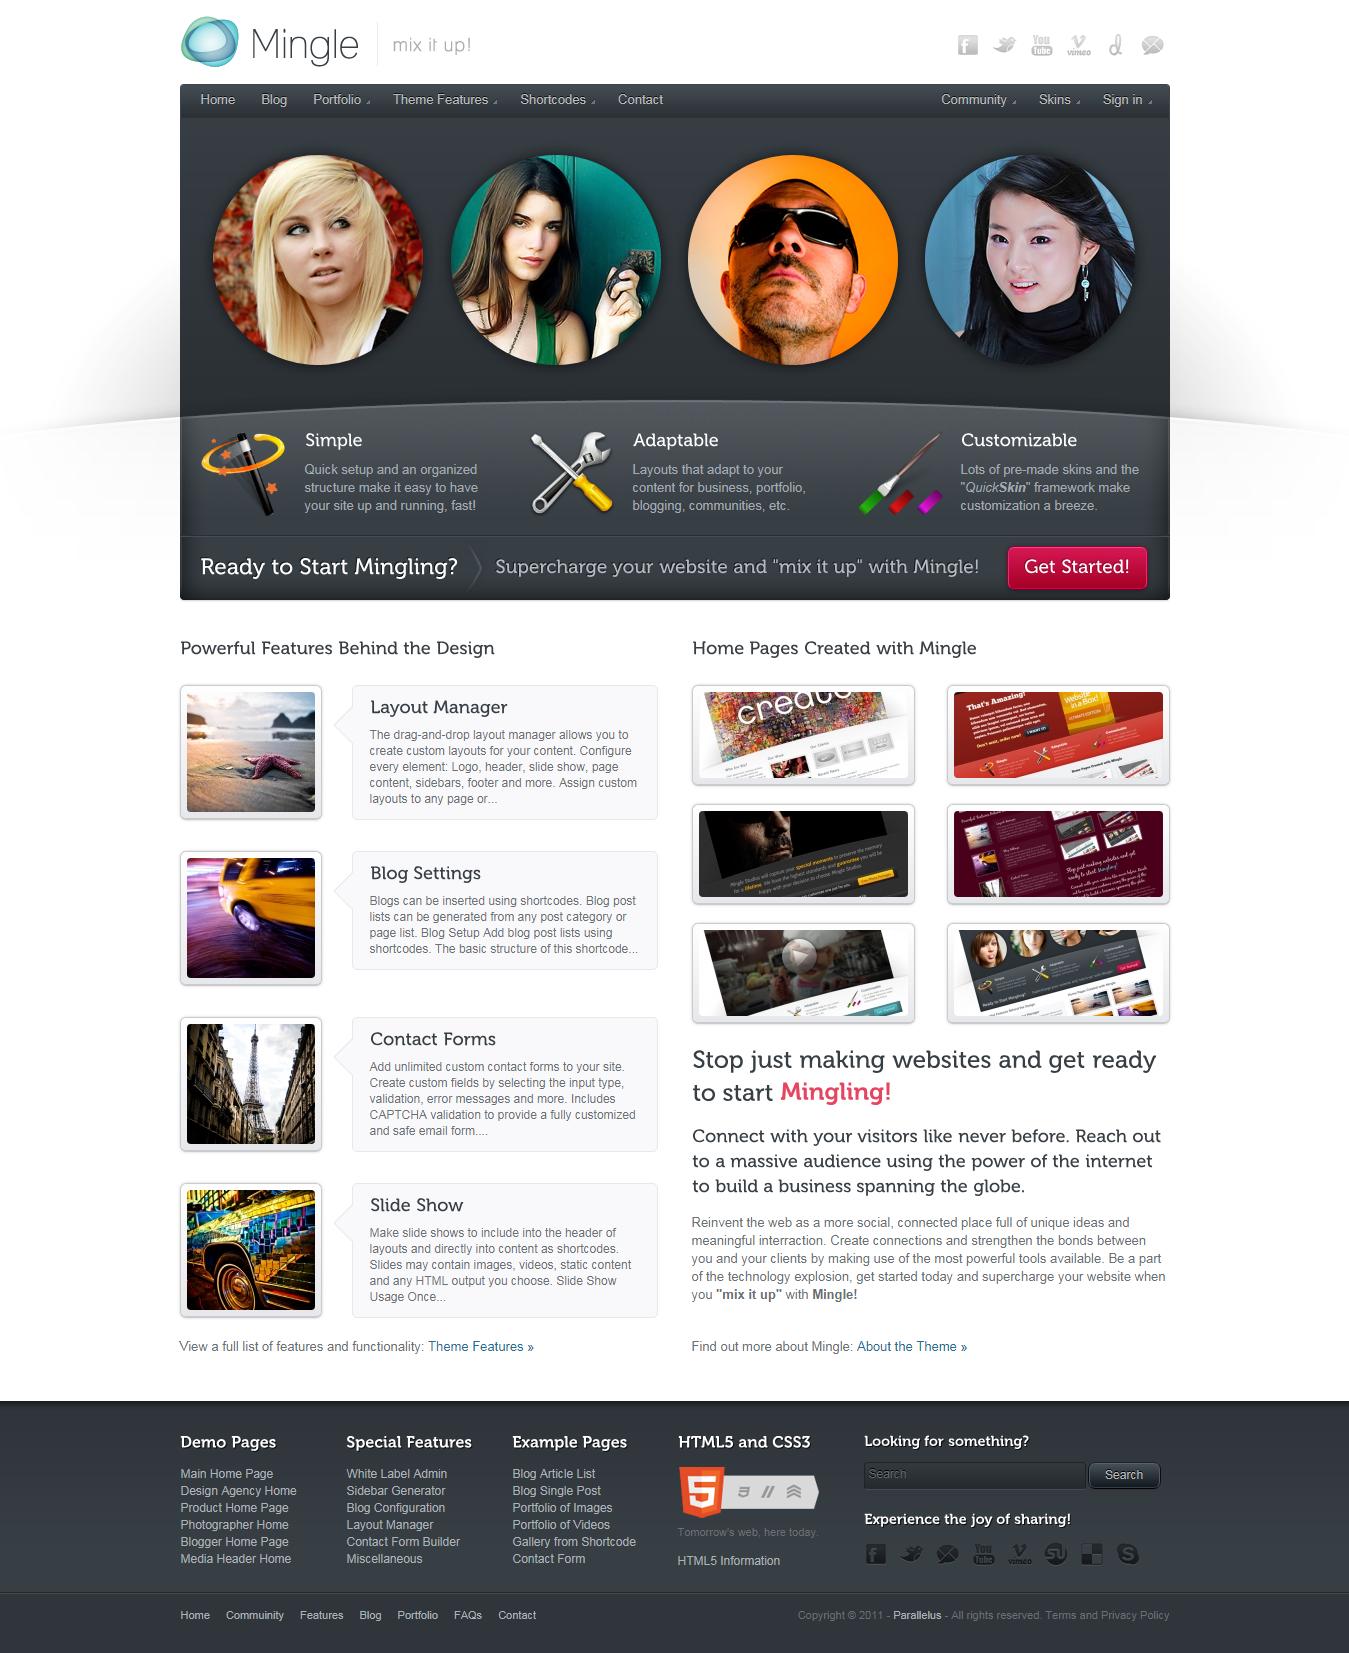 mingle best premium buddypress wordpress theme - 10+ Best Premium BuddyPress WordPress Themes